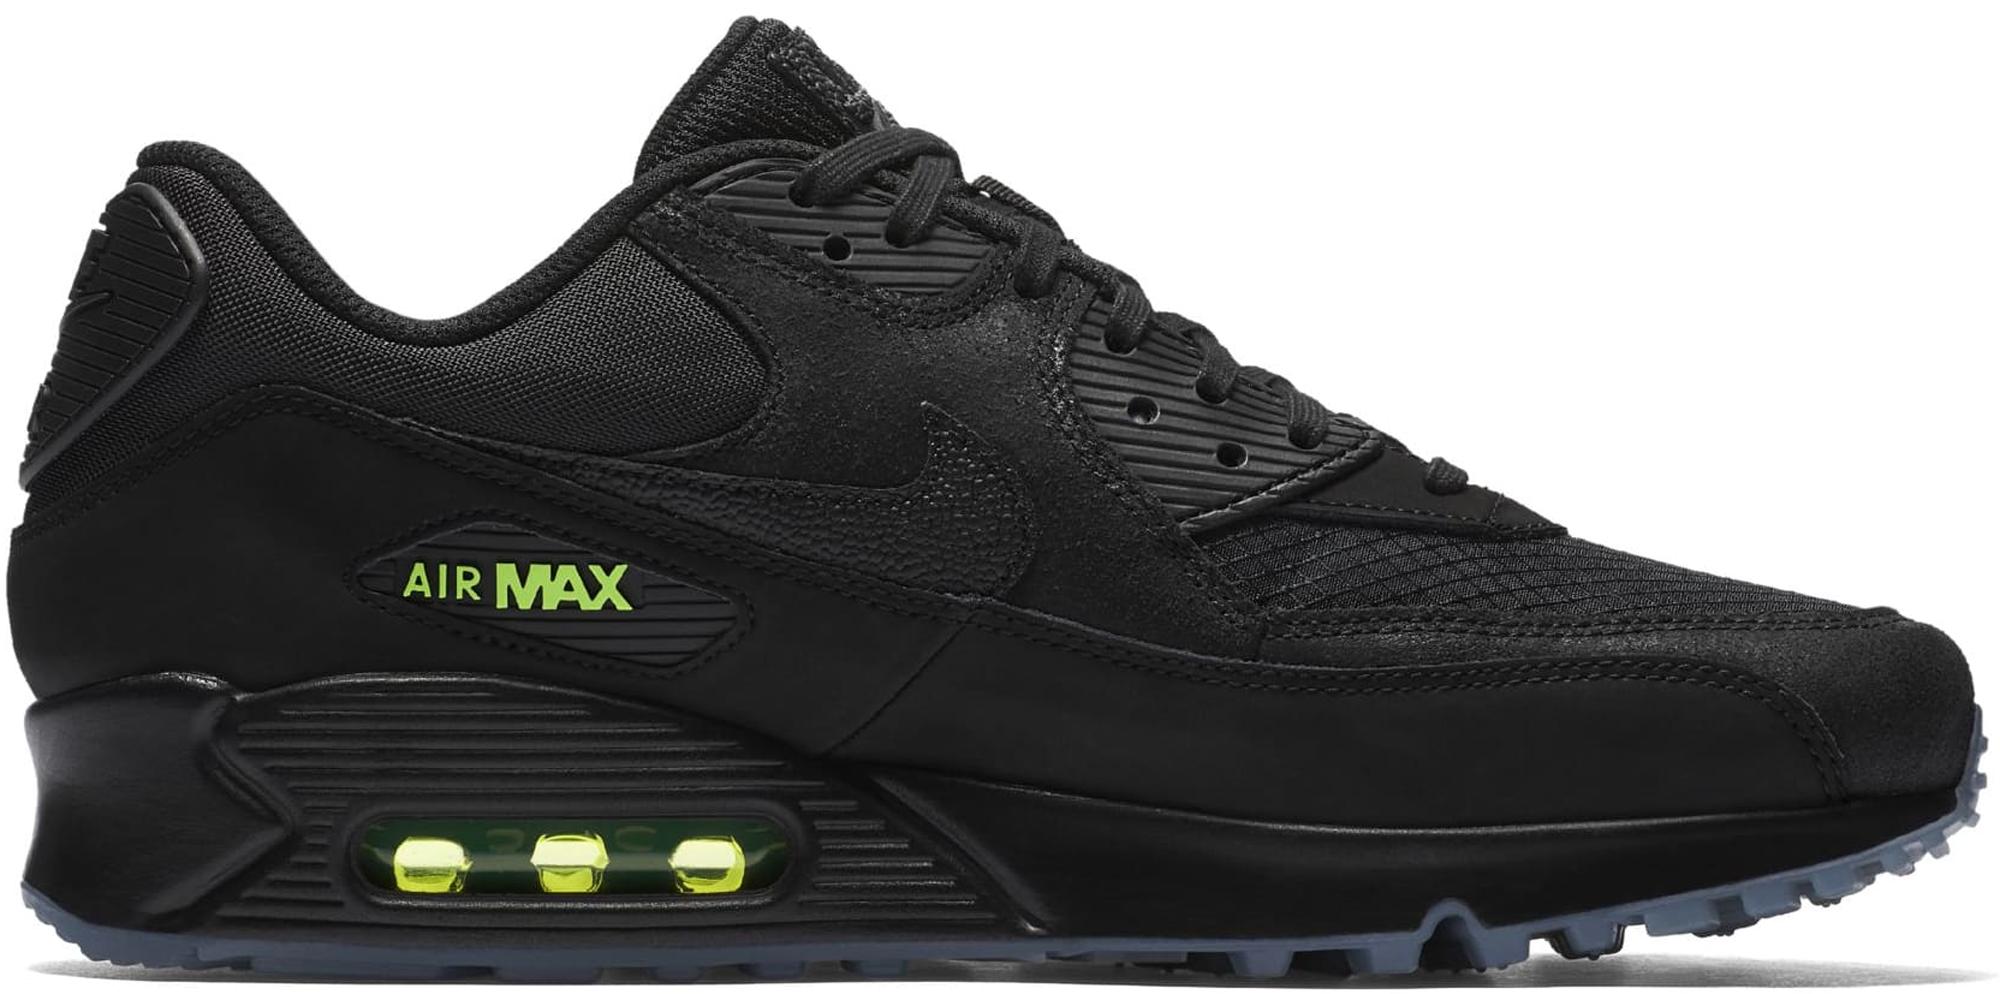 Nike Air Max 90 Black Volt - AQ6101-001